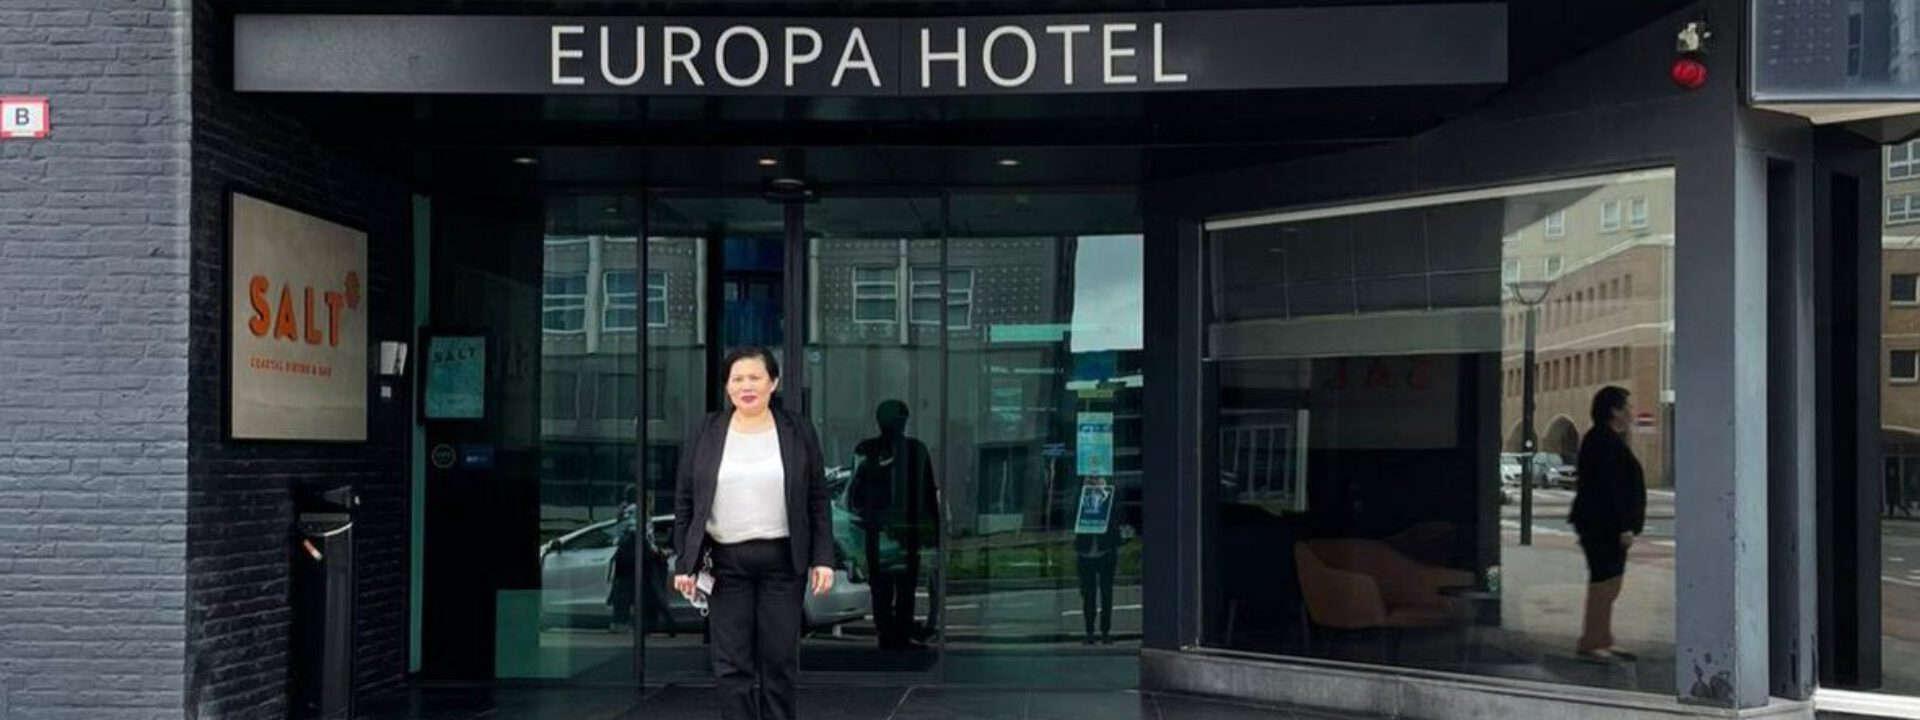 Event Hotels en EW Facility Services zetten succesvolle samenwerking voort